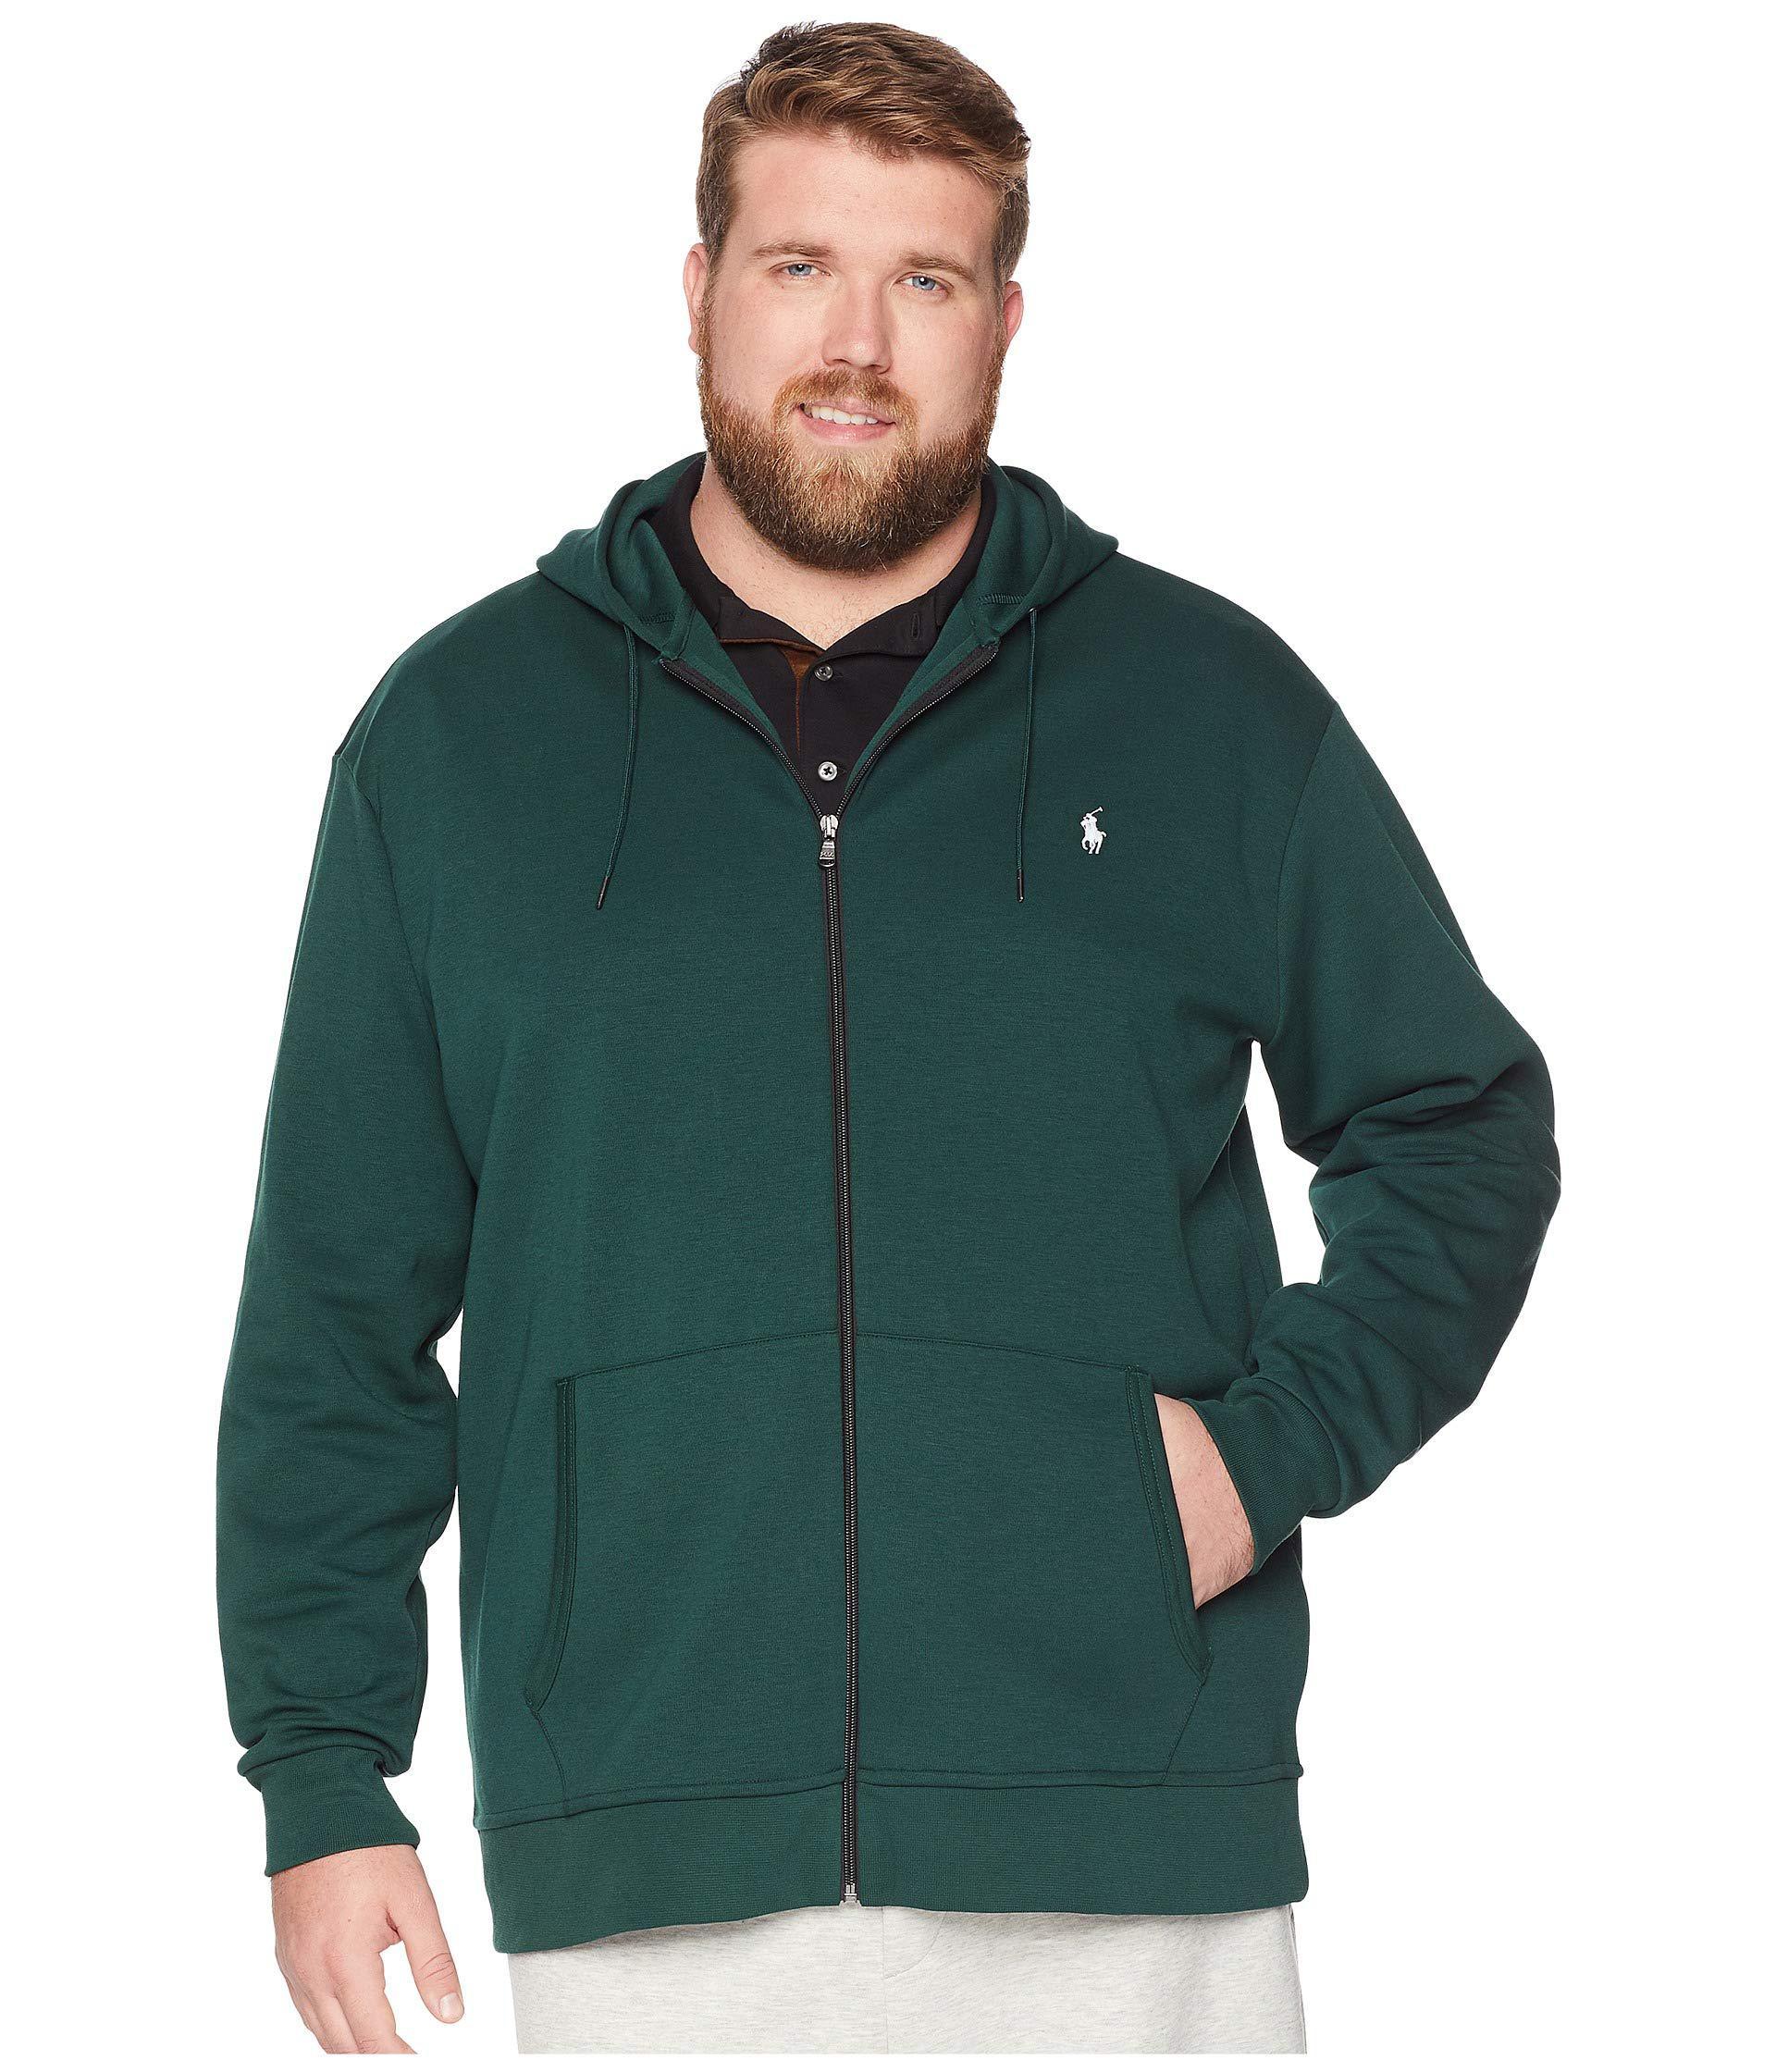 Lyst - Polo Ralph Lauren Big Tall Double Knit Full Zip (college ... 74dbbdbbf